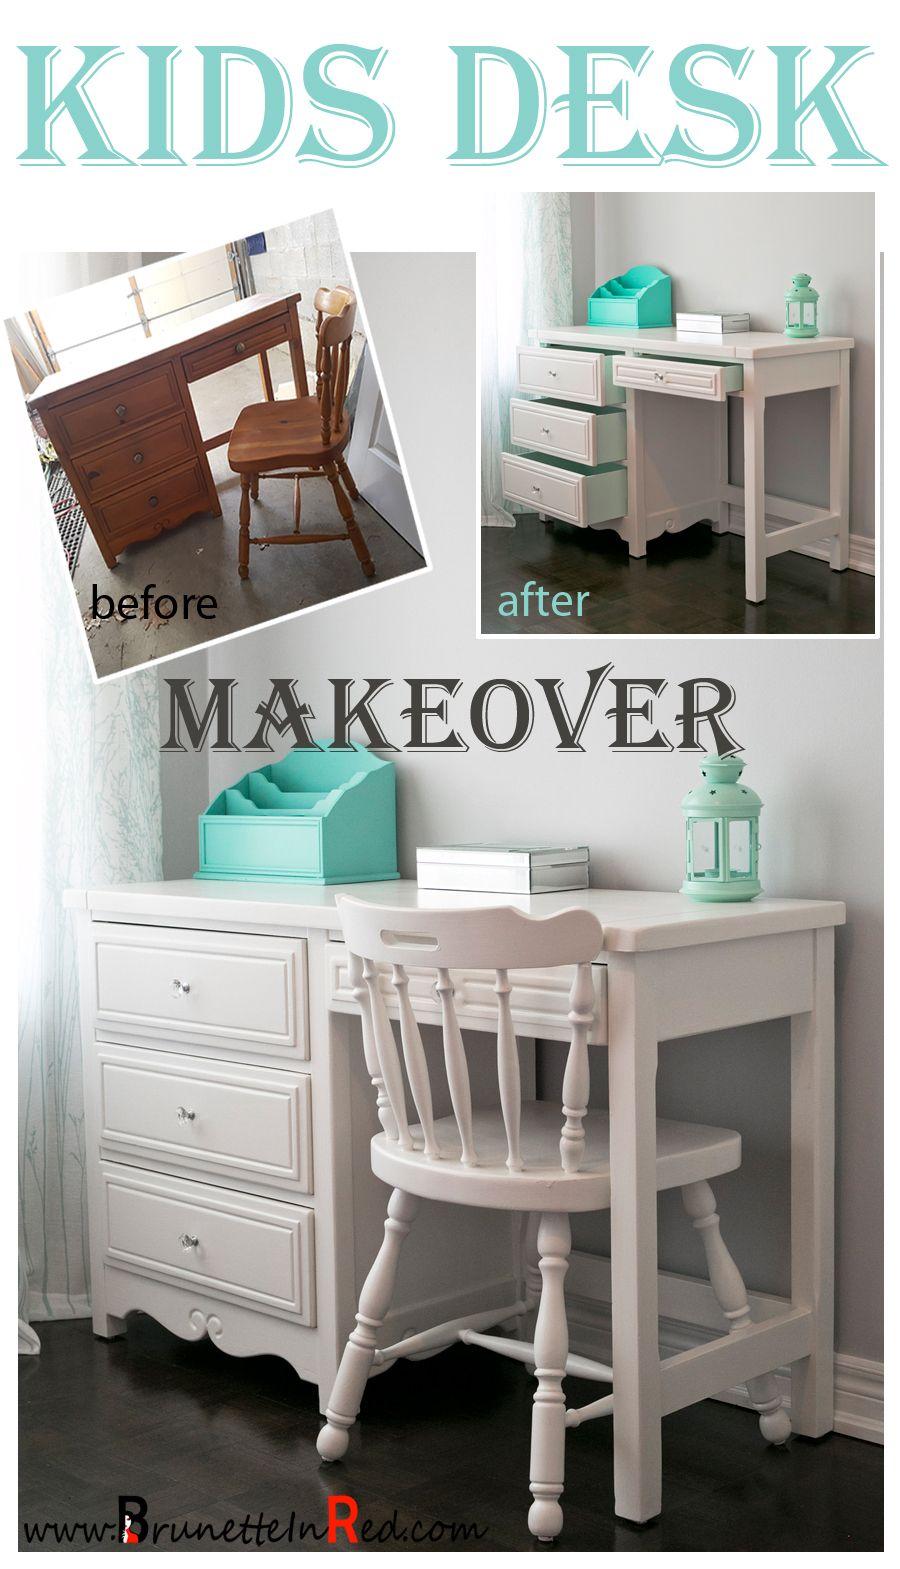 repurposed furniture for kids. |Kids |Desk |Makeover |Repurposed Old Desk. #diy #makeover # Repurposed Furniture For Kids